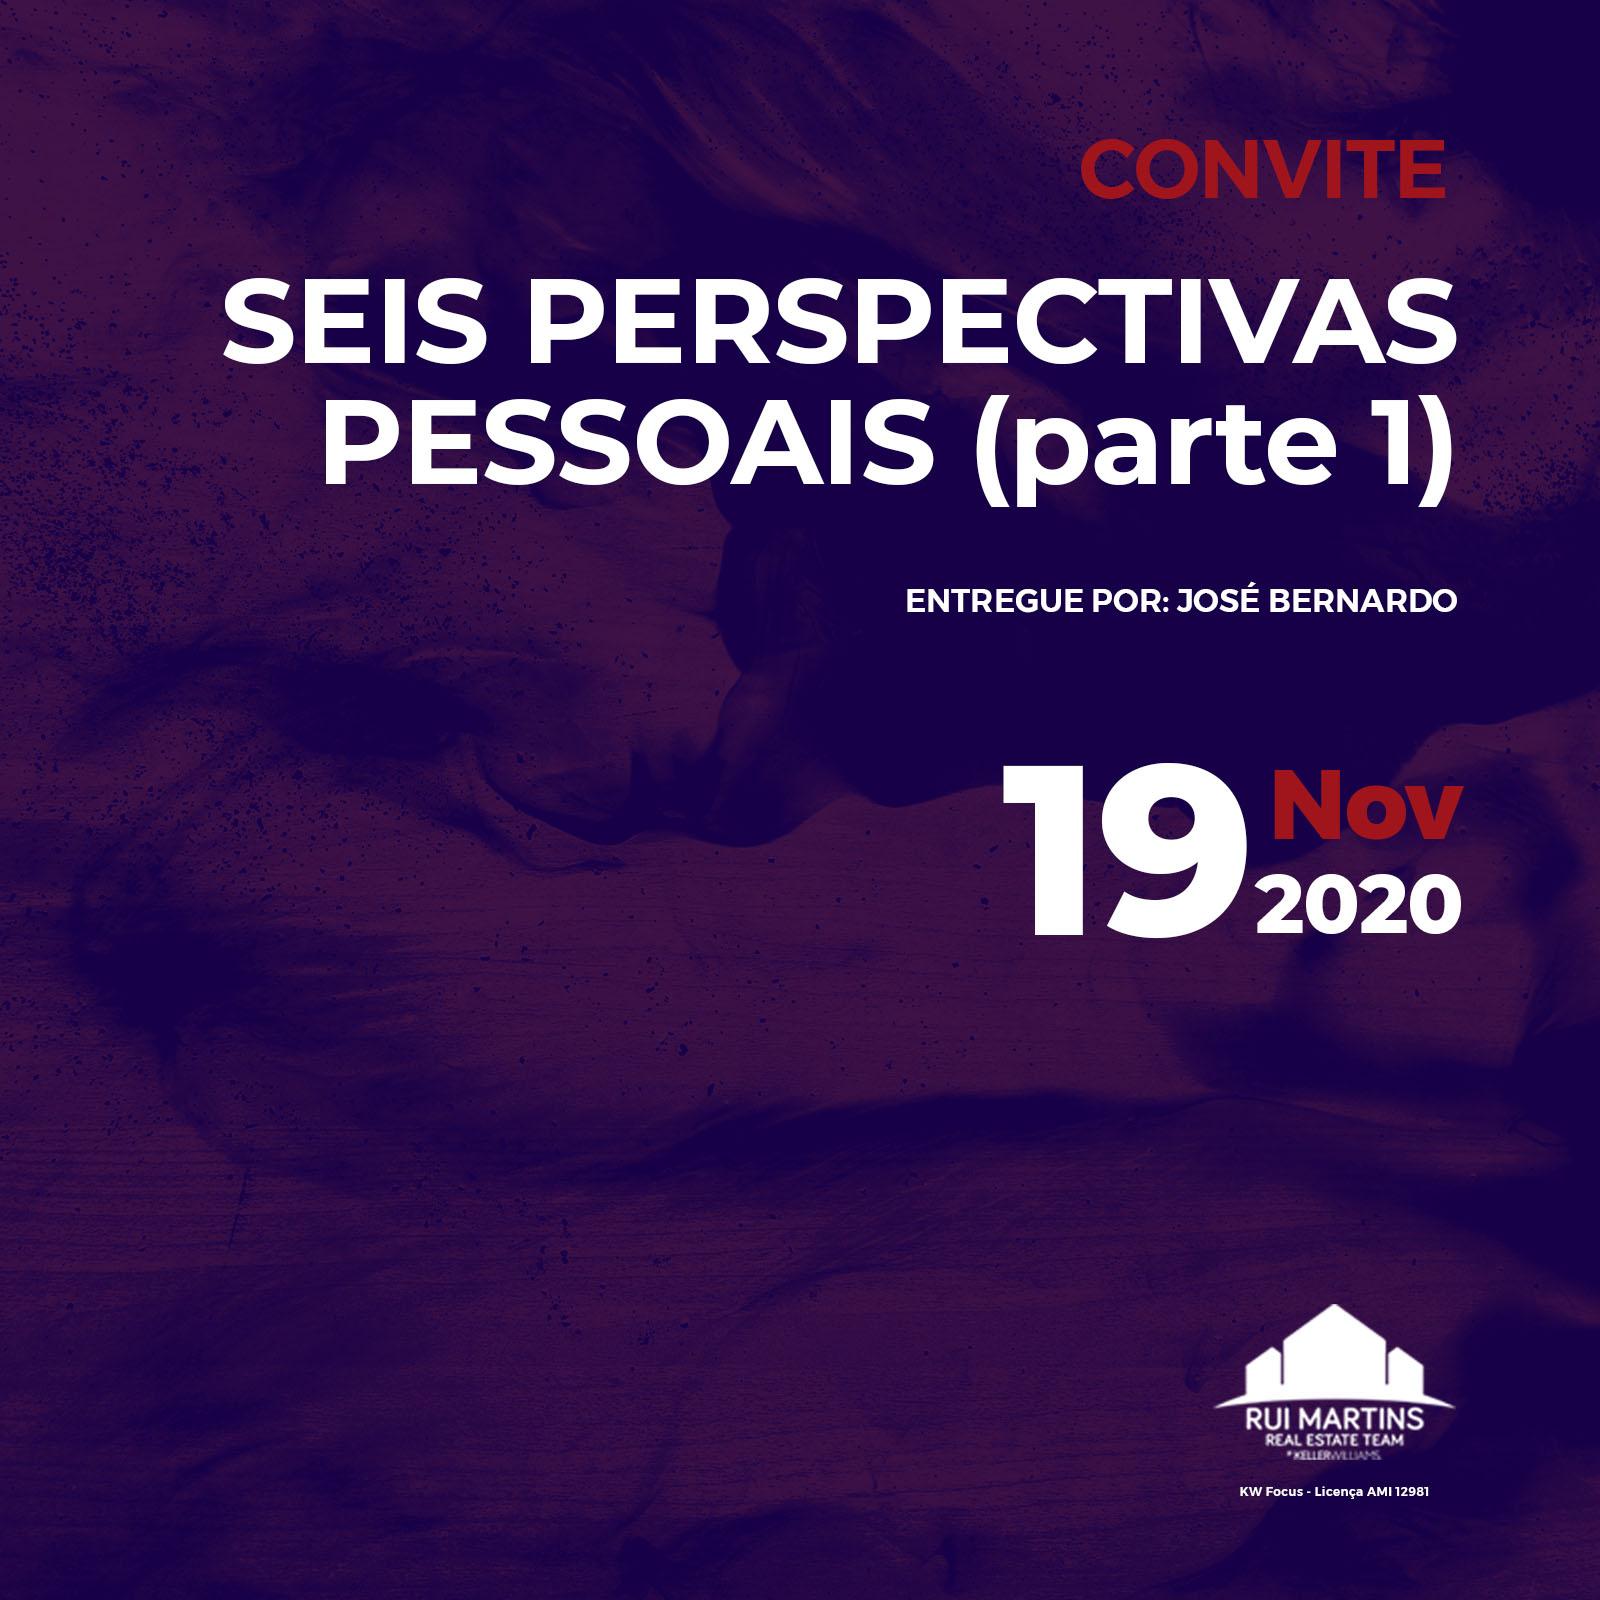 convite evento 10 nov